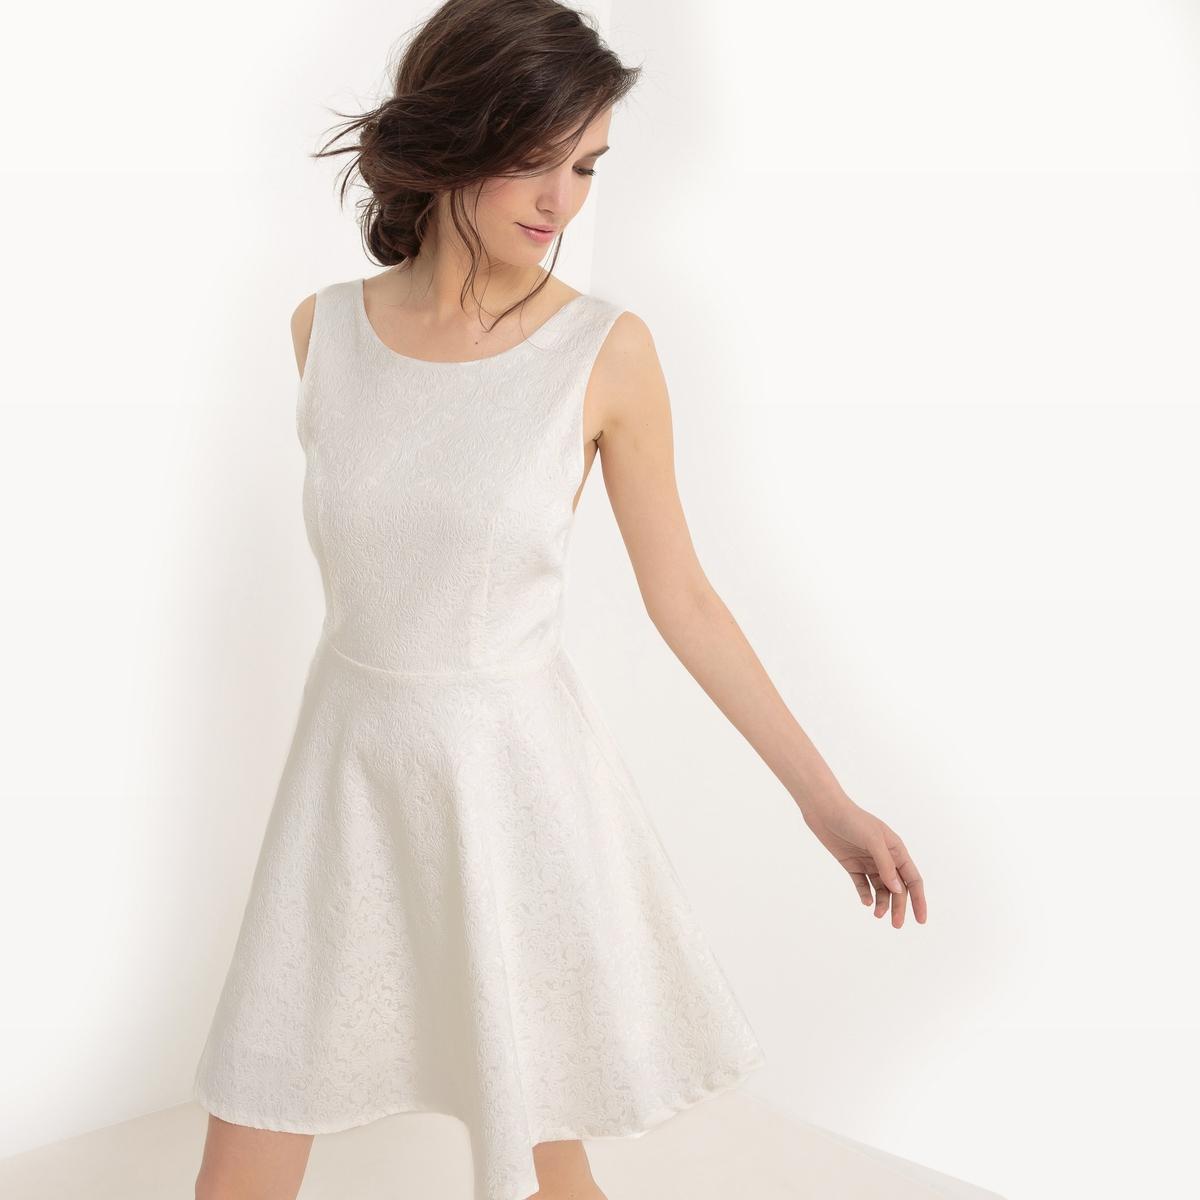 Платье короткое, без рукавов платье без рукавов 85% хлопка